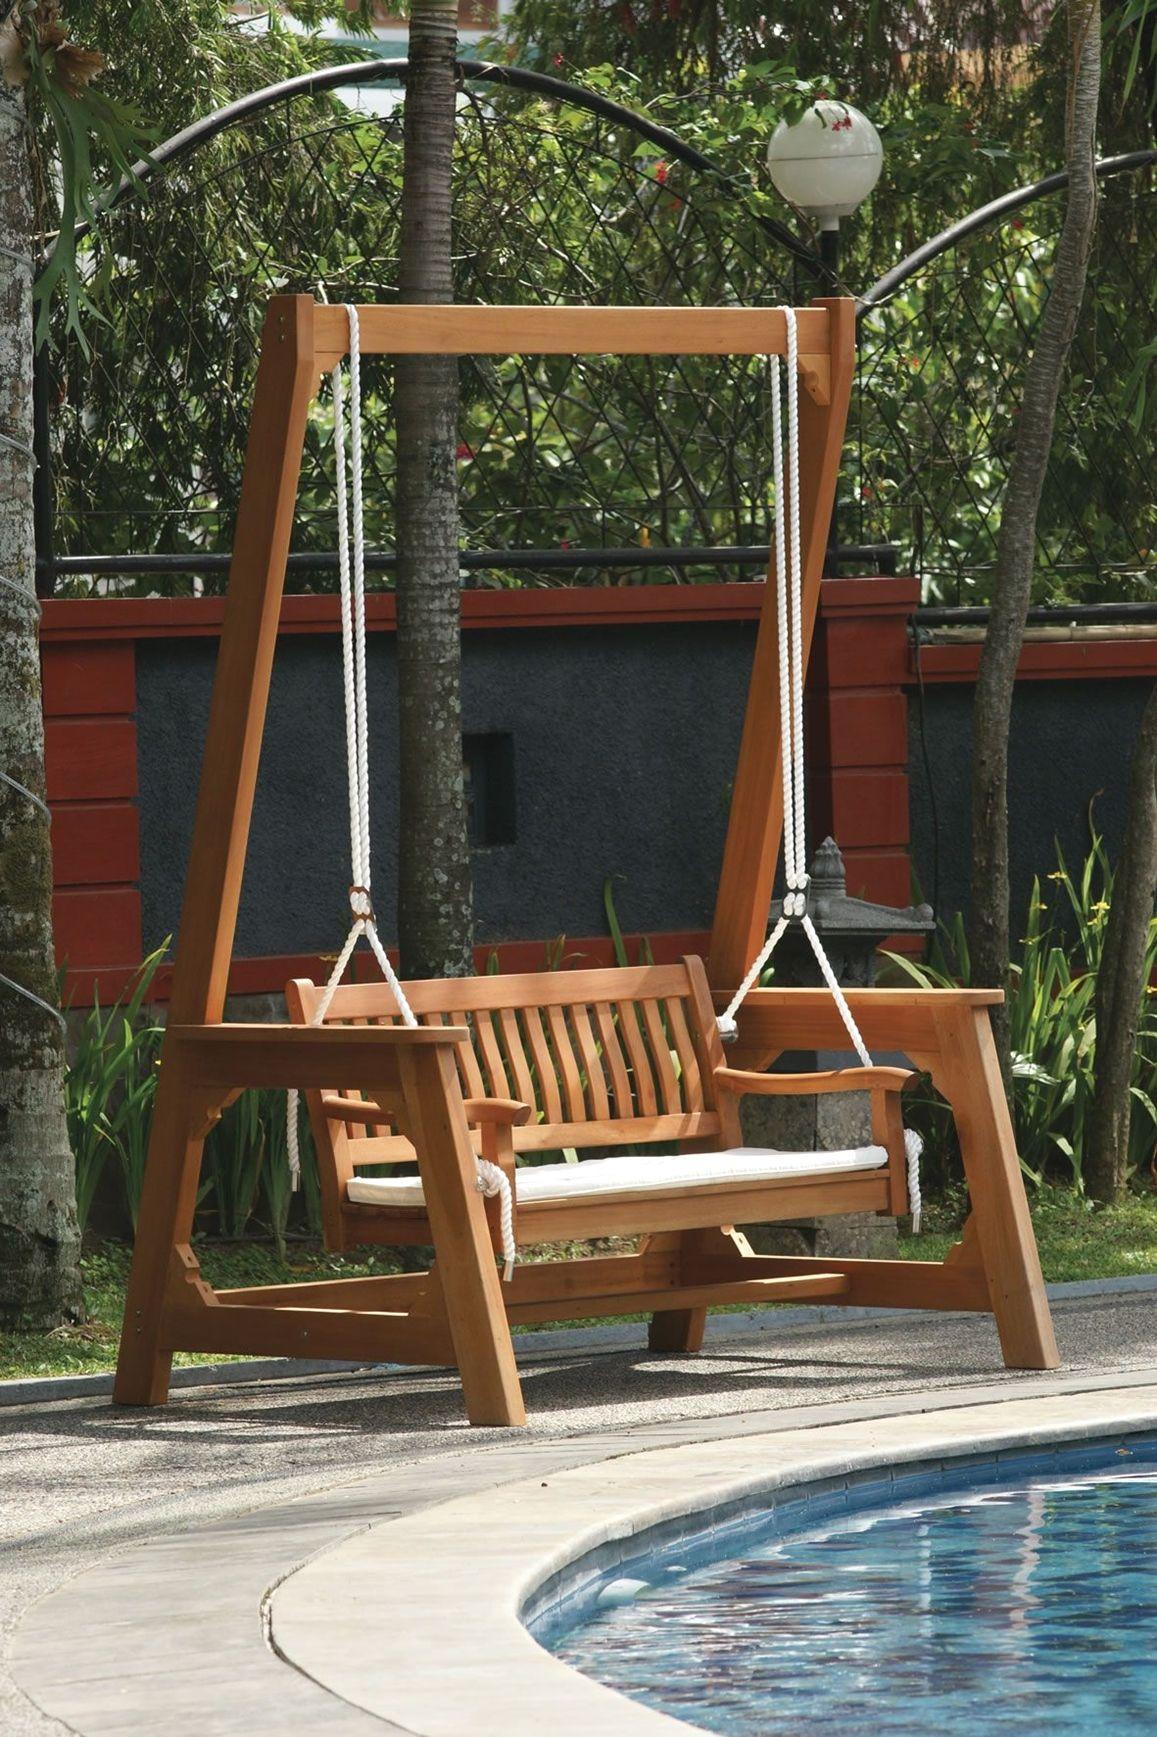 Wooden Garden Swing Bench Plans With Images Wooden Garden